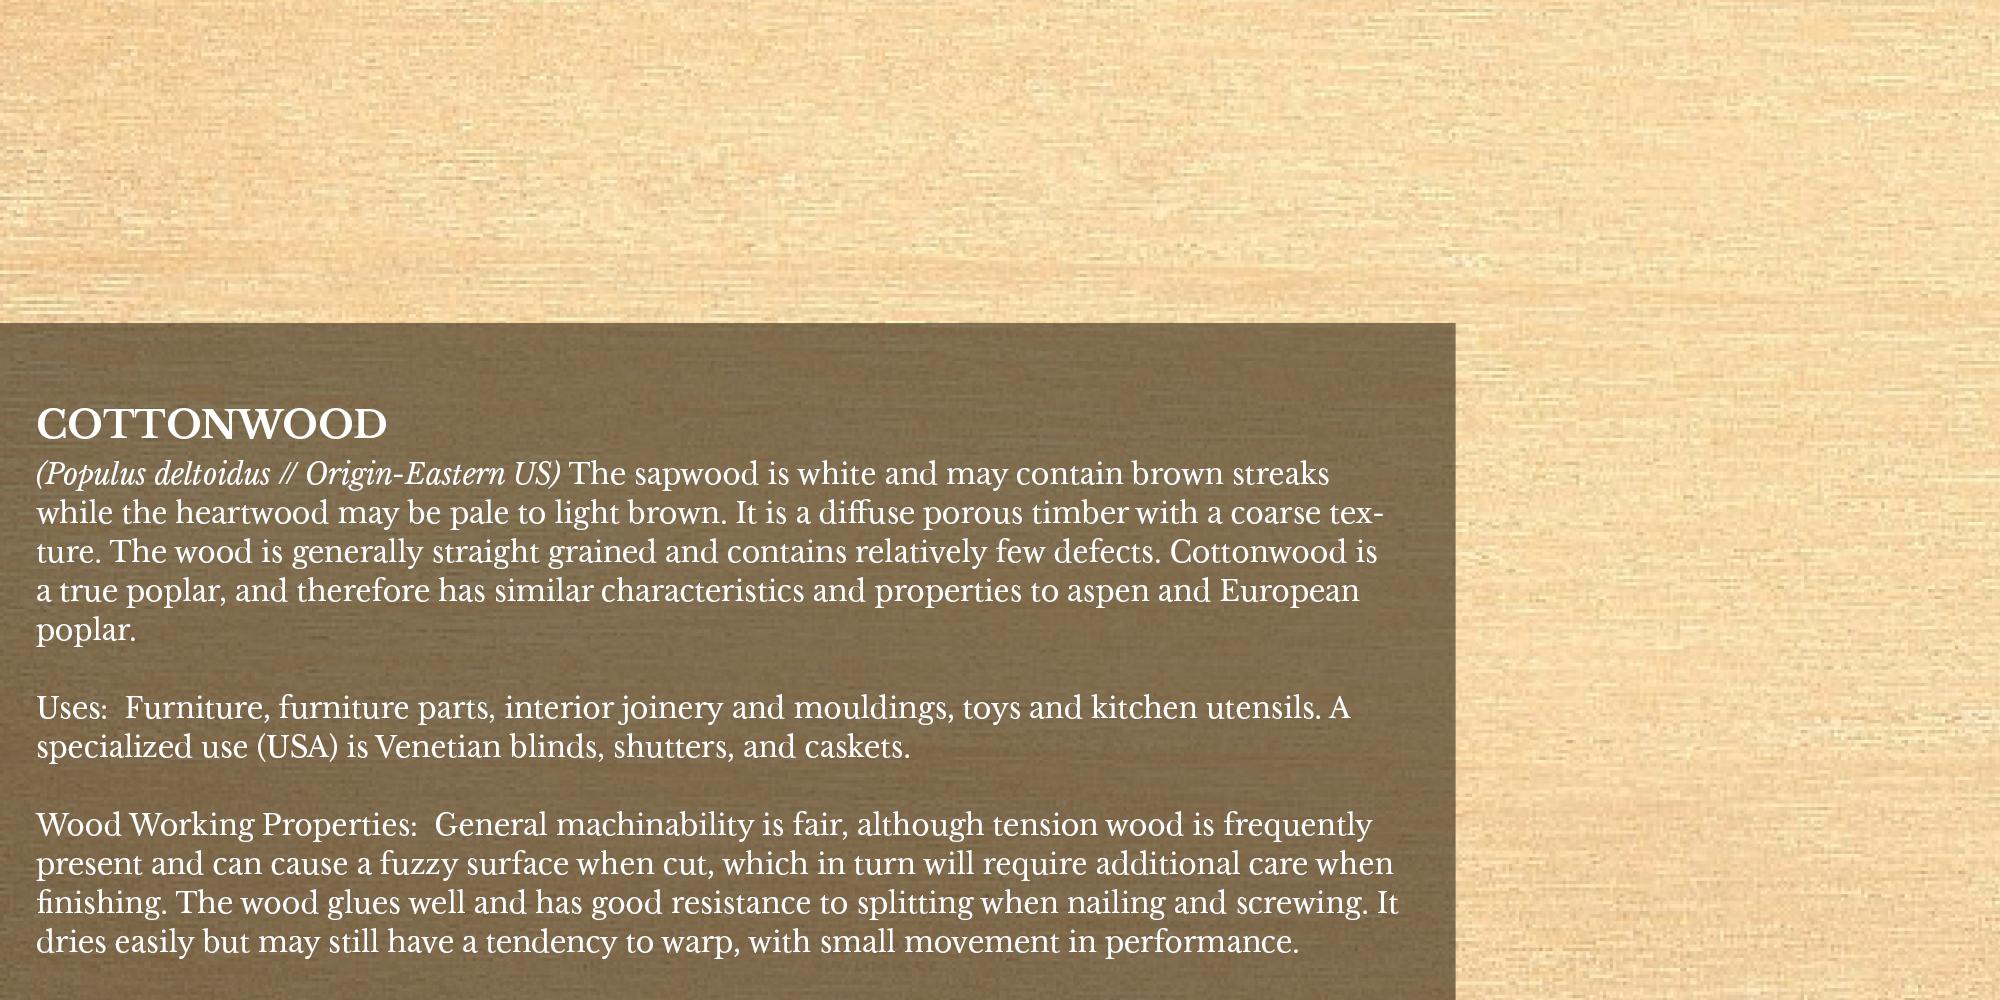 Hardwoods - Superior Hardwoods